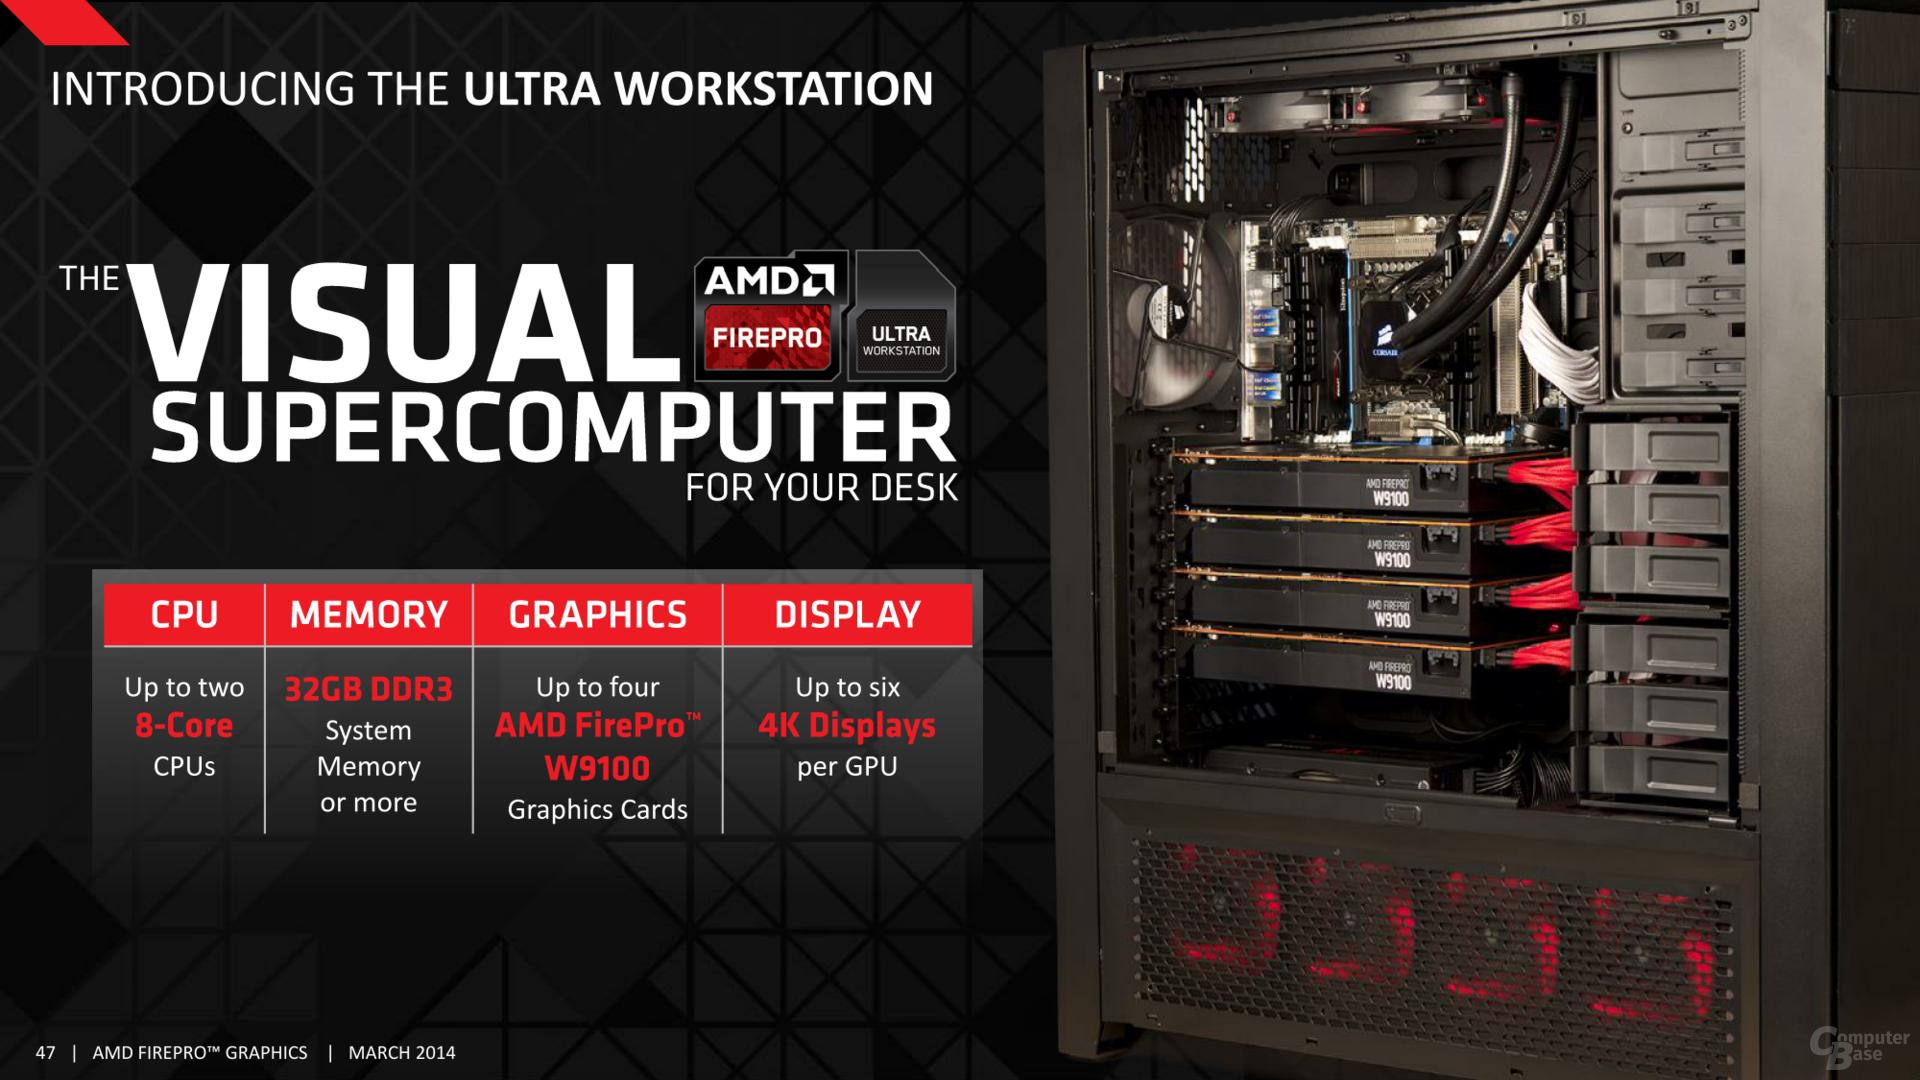 AMD Ultra Workstation